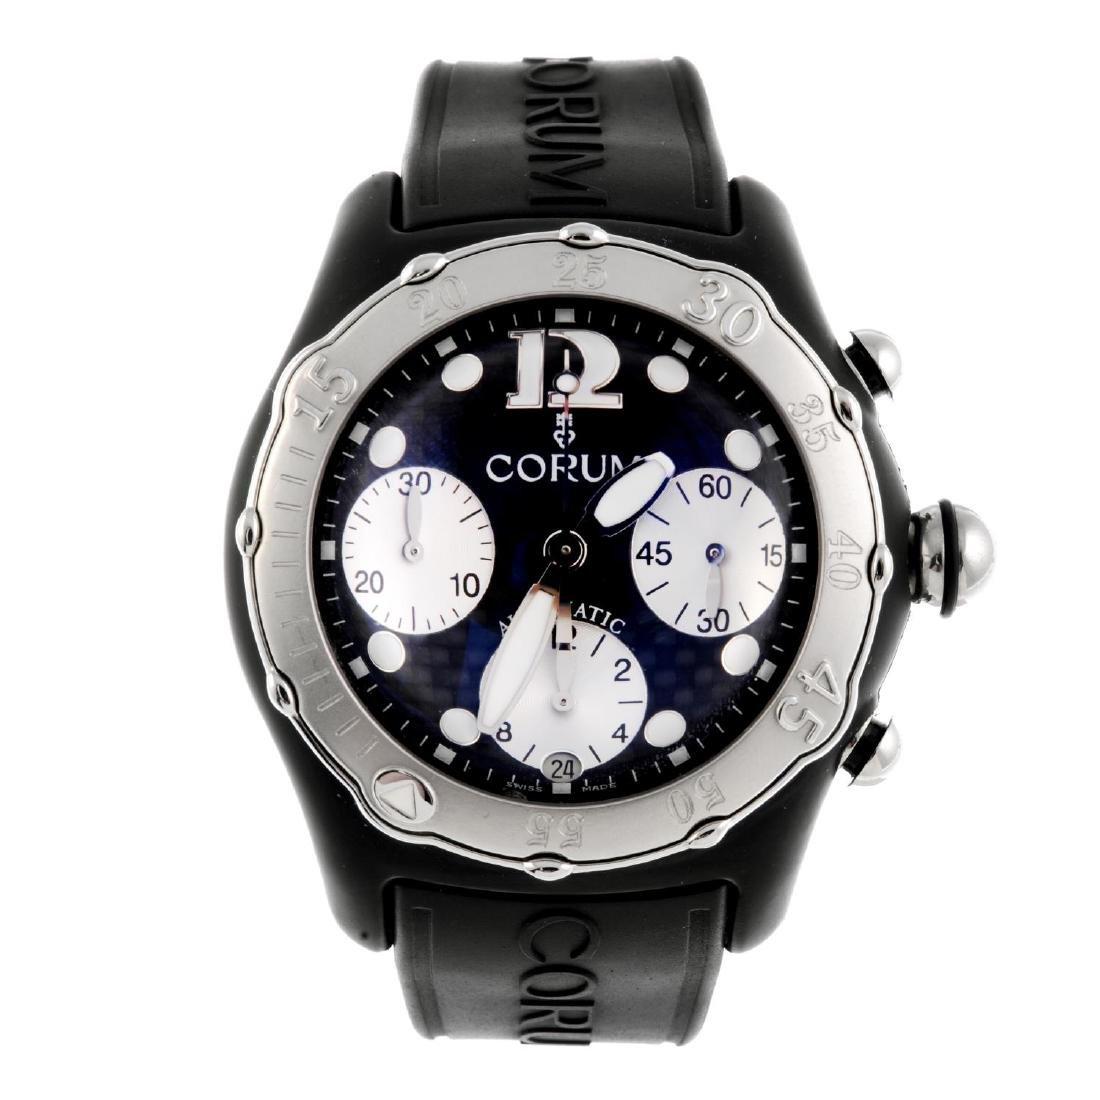 CORUM - a gentleman's Bubble Midnight chronograph wrist